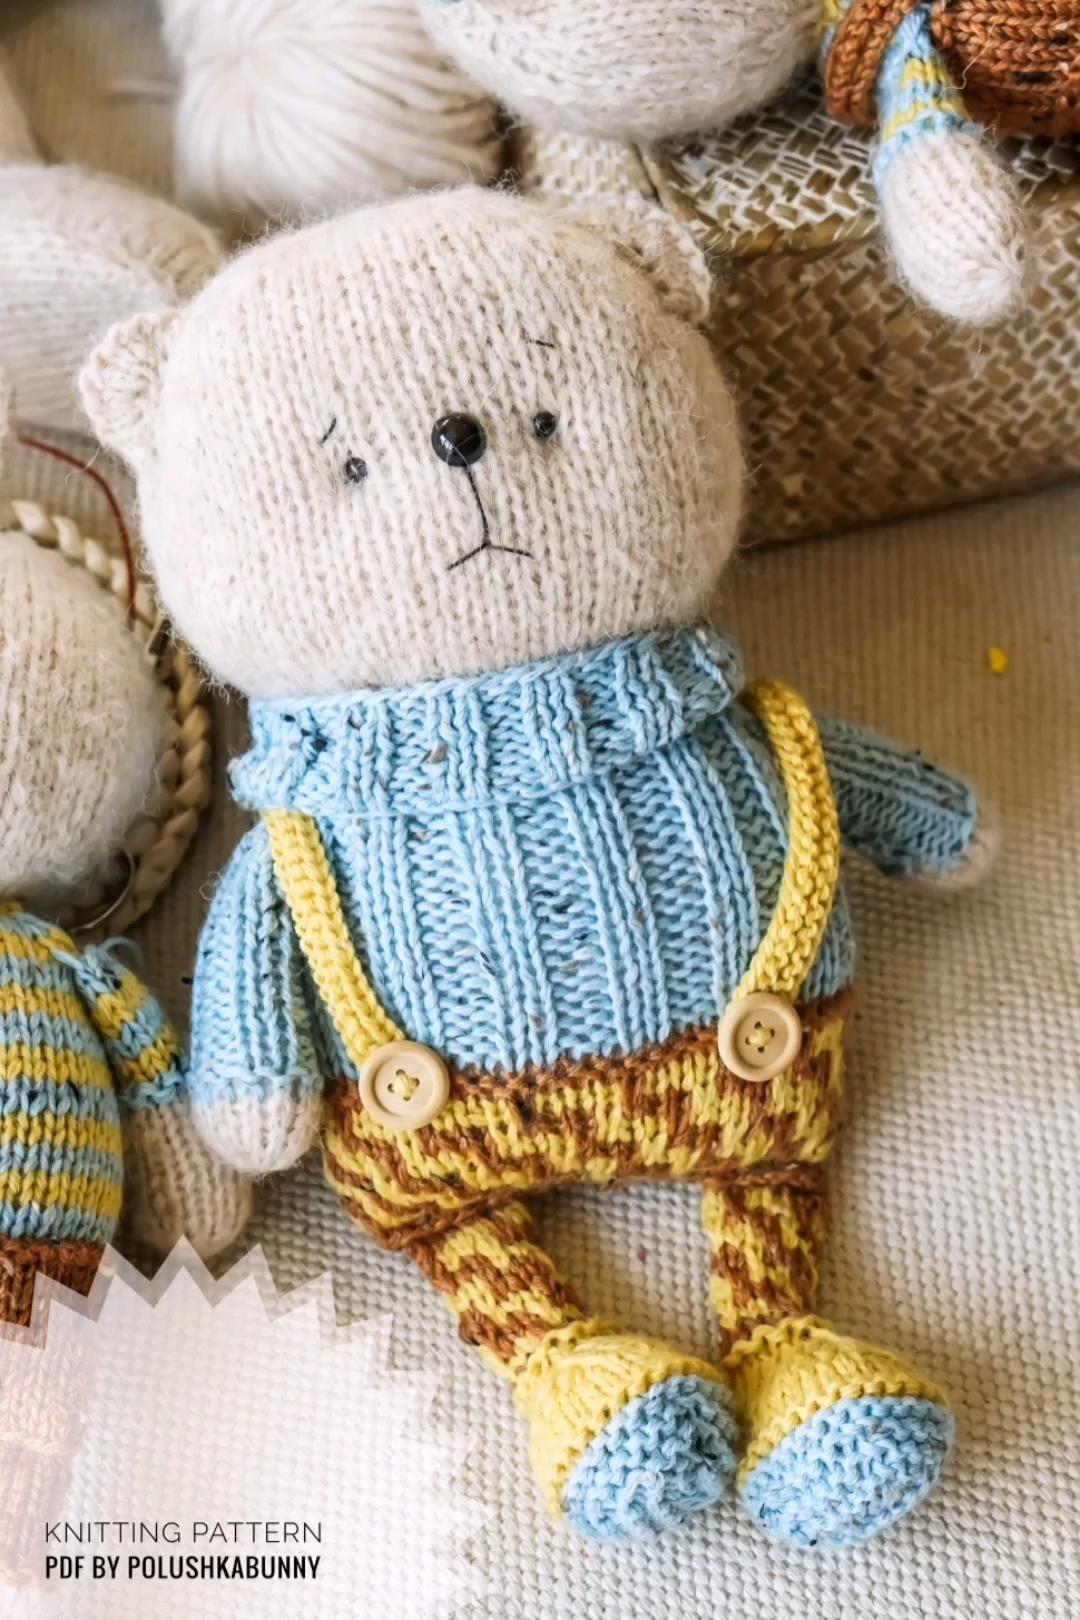 Photo of Knitting Pattern pdf – Cozy Friend Bear Toy by Polushkabunny #knitting #pattern #toy #teddy #bear